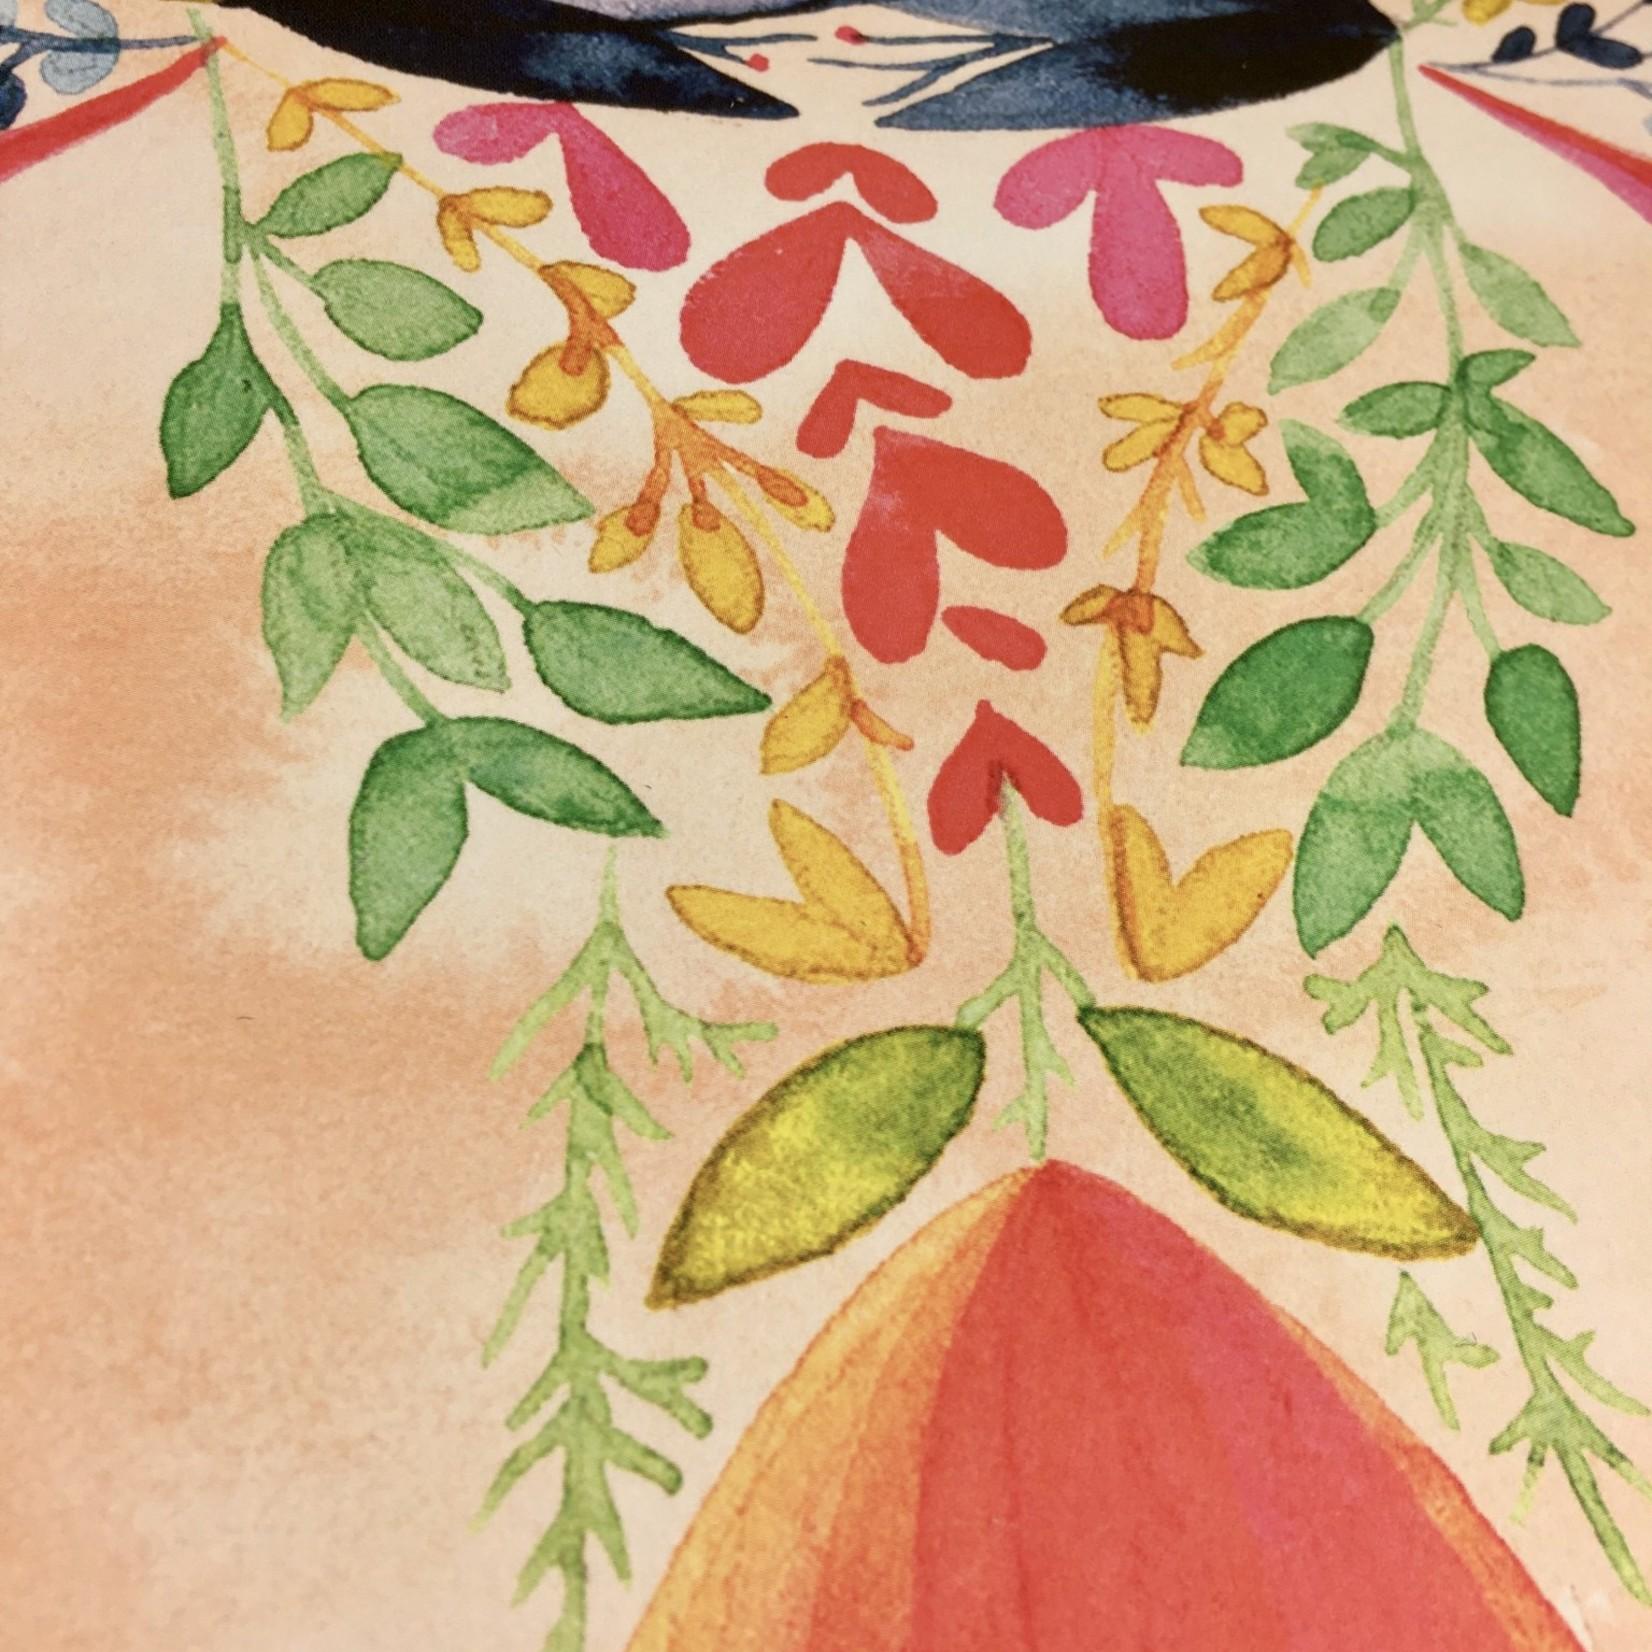 Meera Lee Patel Floral Watercolor Female 11x14 Art Print